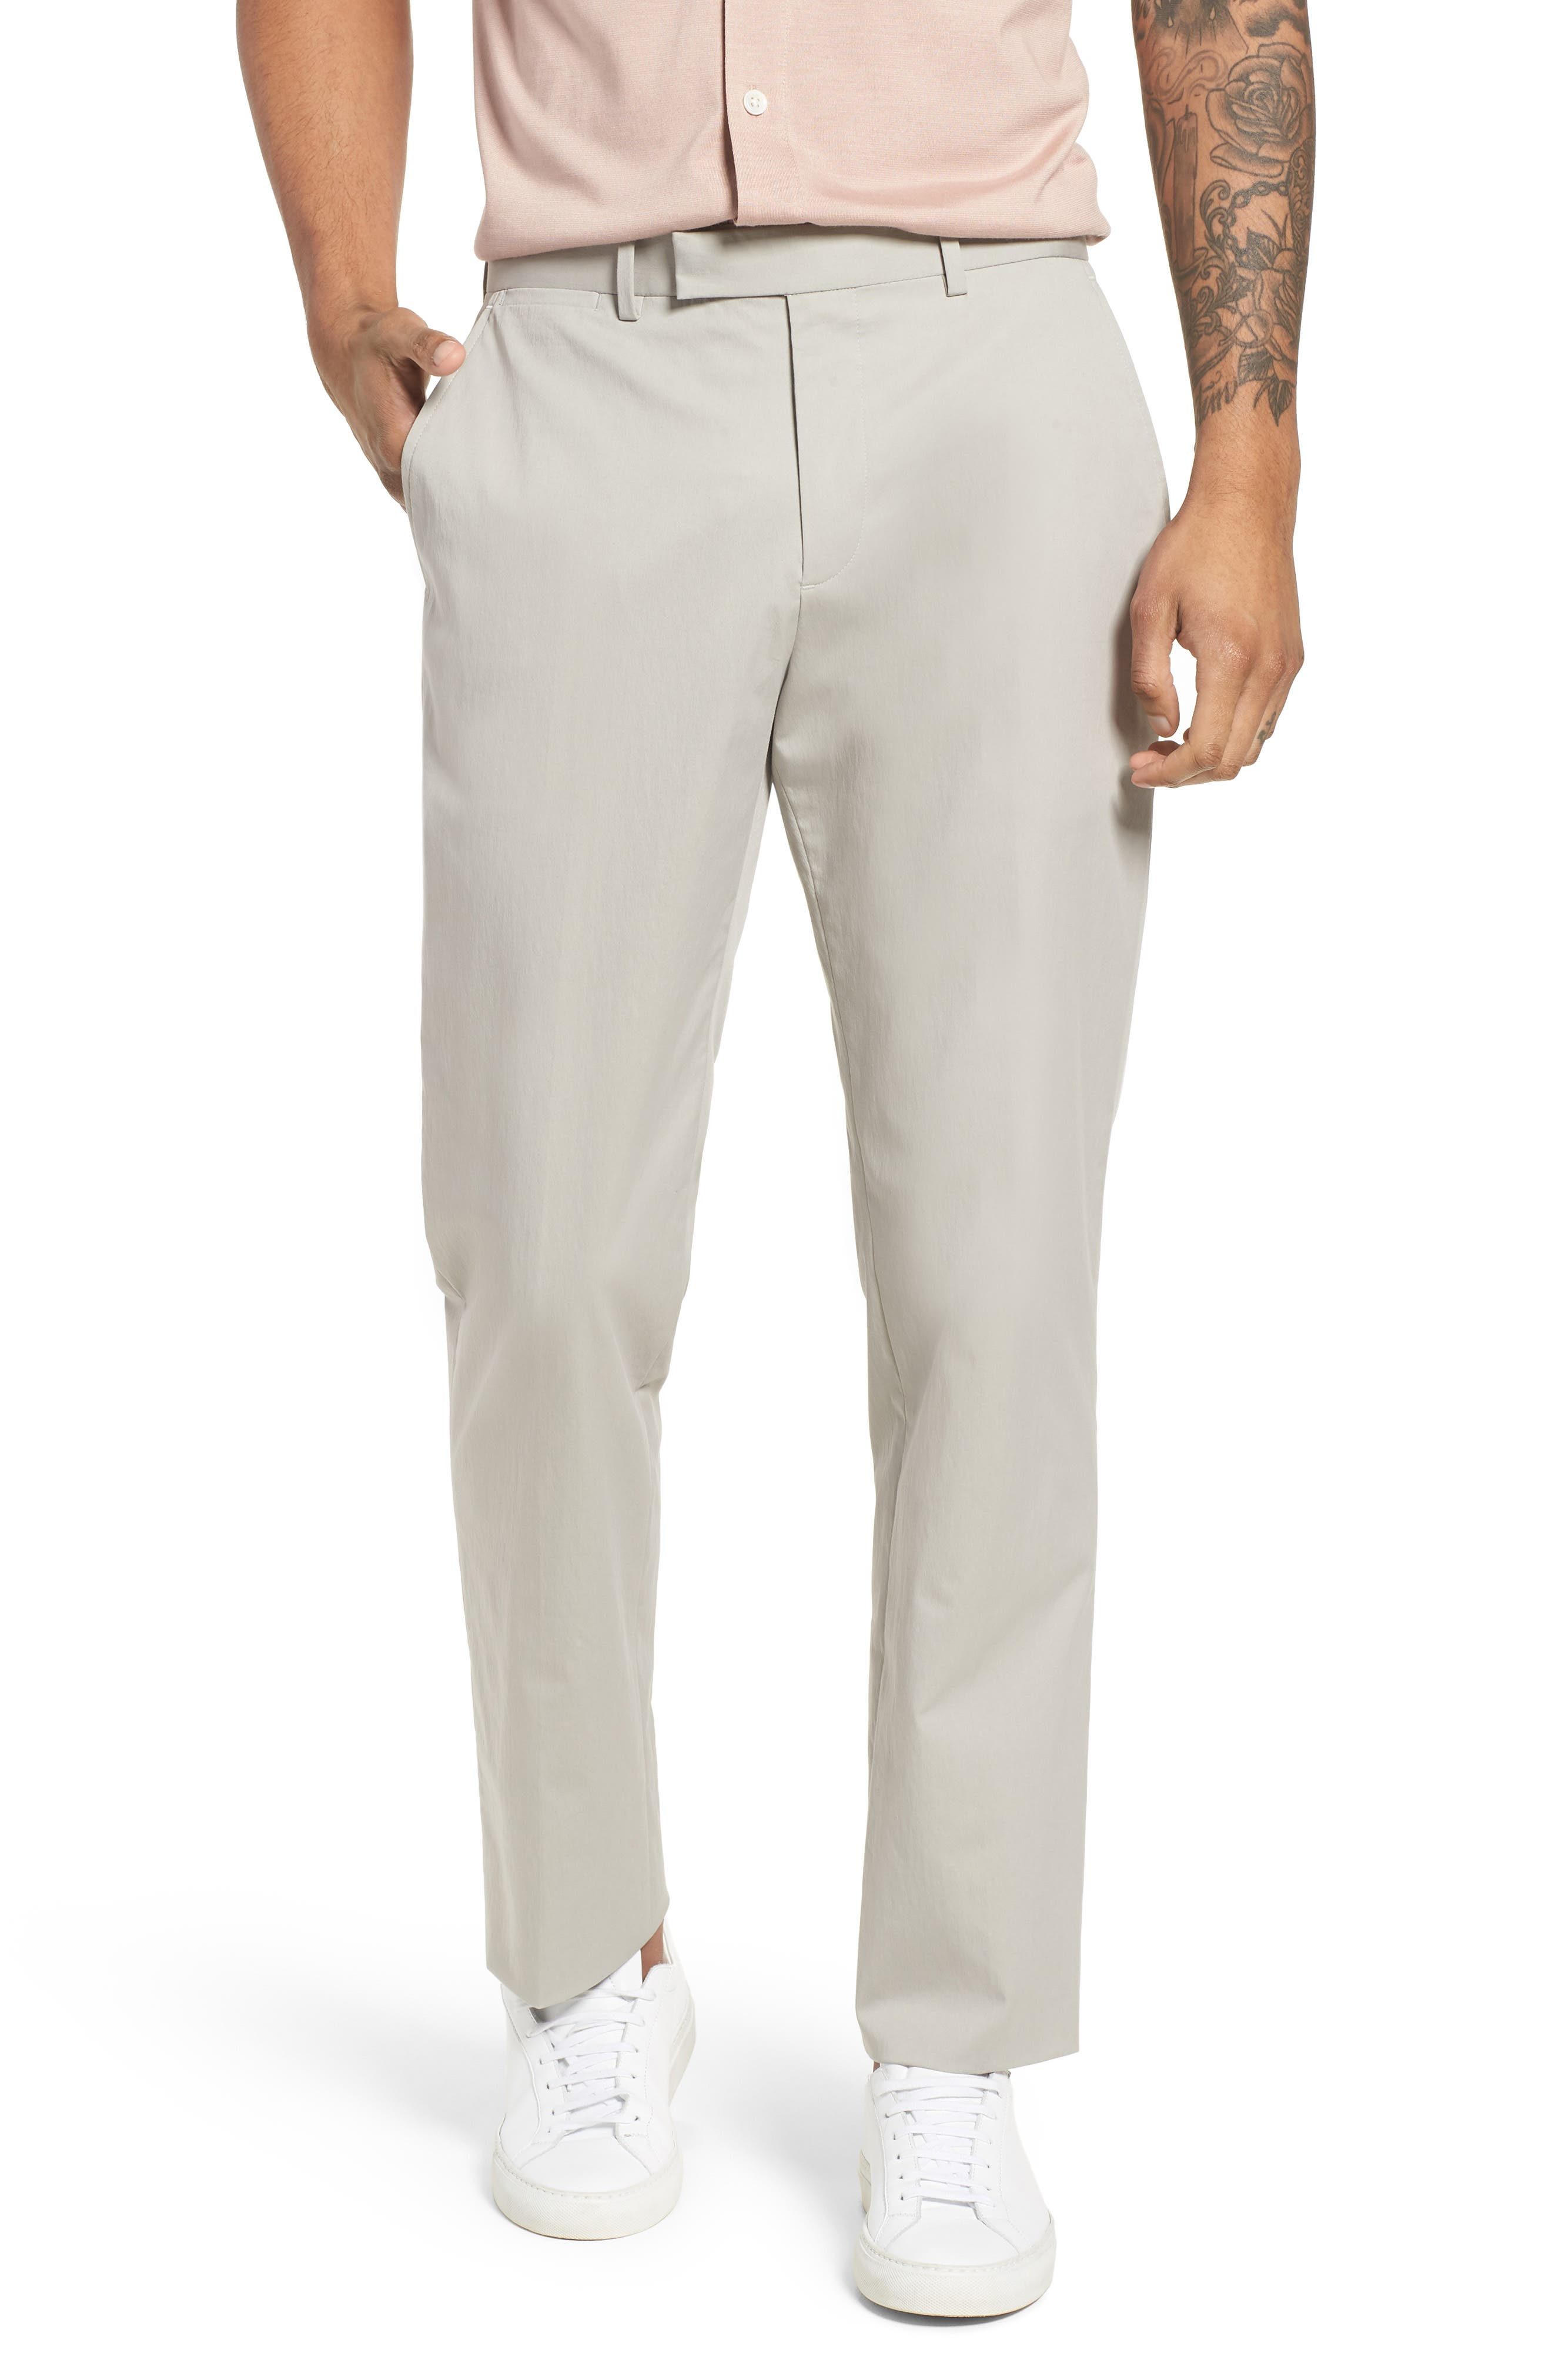 Zaine Technical Flat Front Stretch Pants,                             Main thumbnail 1, color,                             Ash